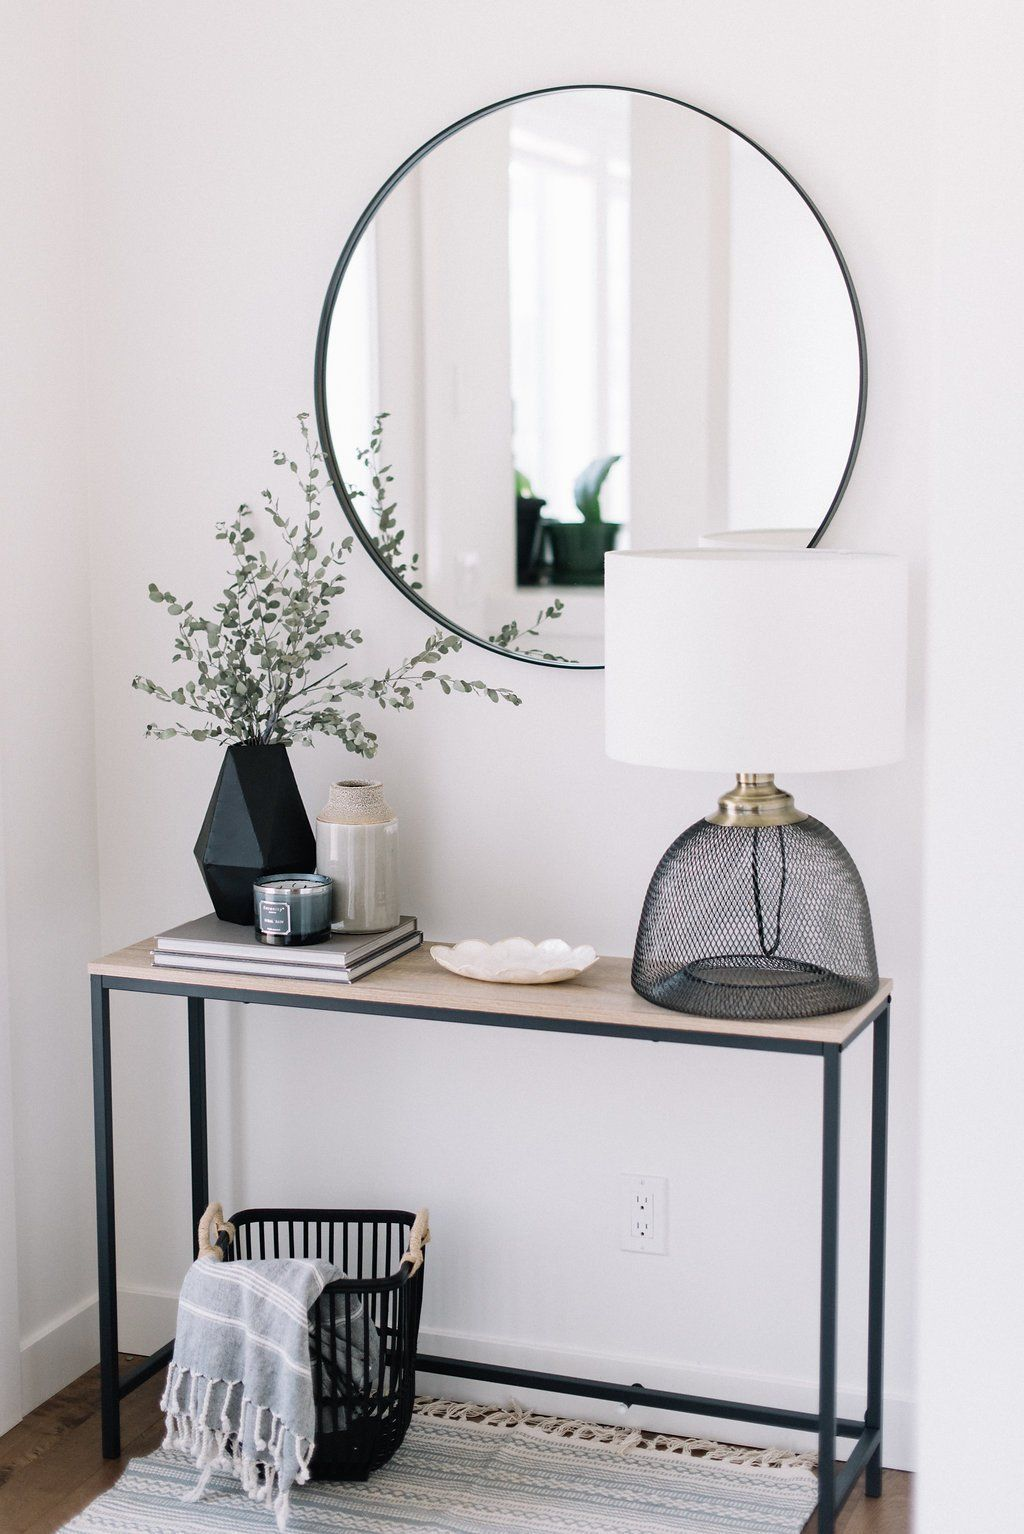 Minimalist Home Redecorating Inspiration